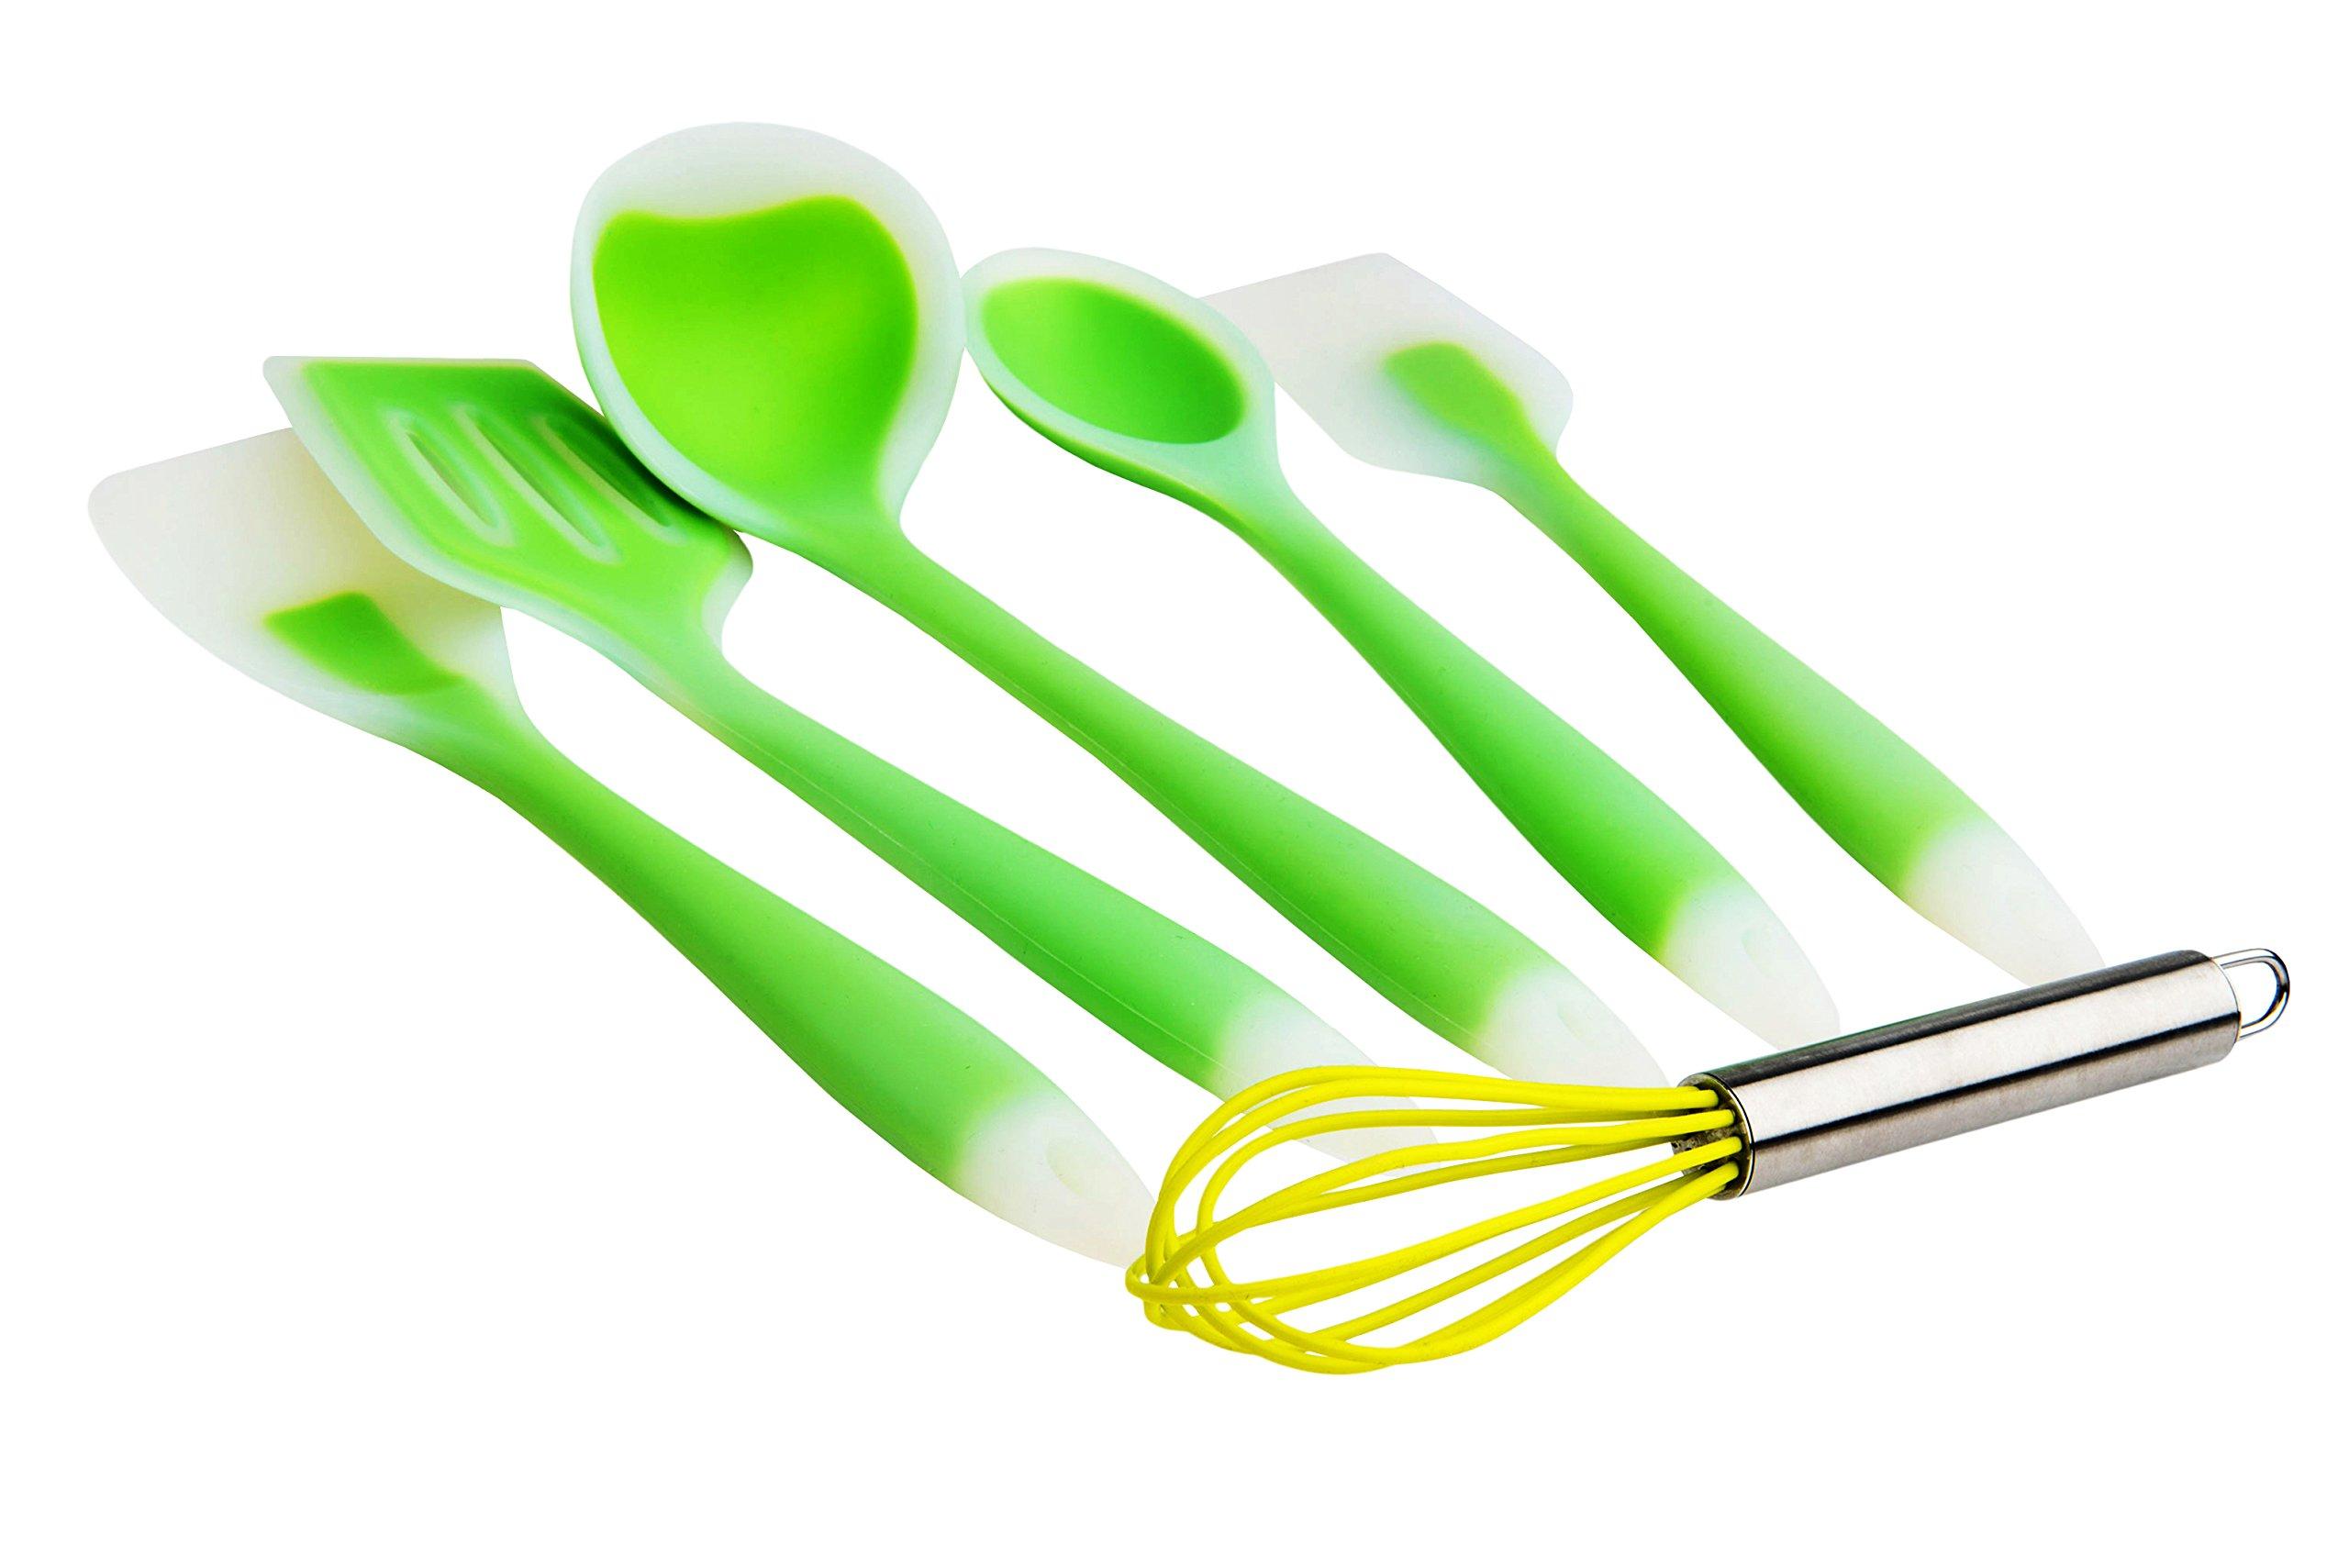 Premium Silicone Kitchen Utensil Set – Non Stick, Heat Resistant Silicone Cookware Spatulas 5+1 Gift Set – 100% Food Grade Silicone & BPA Free – Comfortable Cooking - Dishwasher Safe